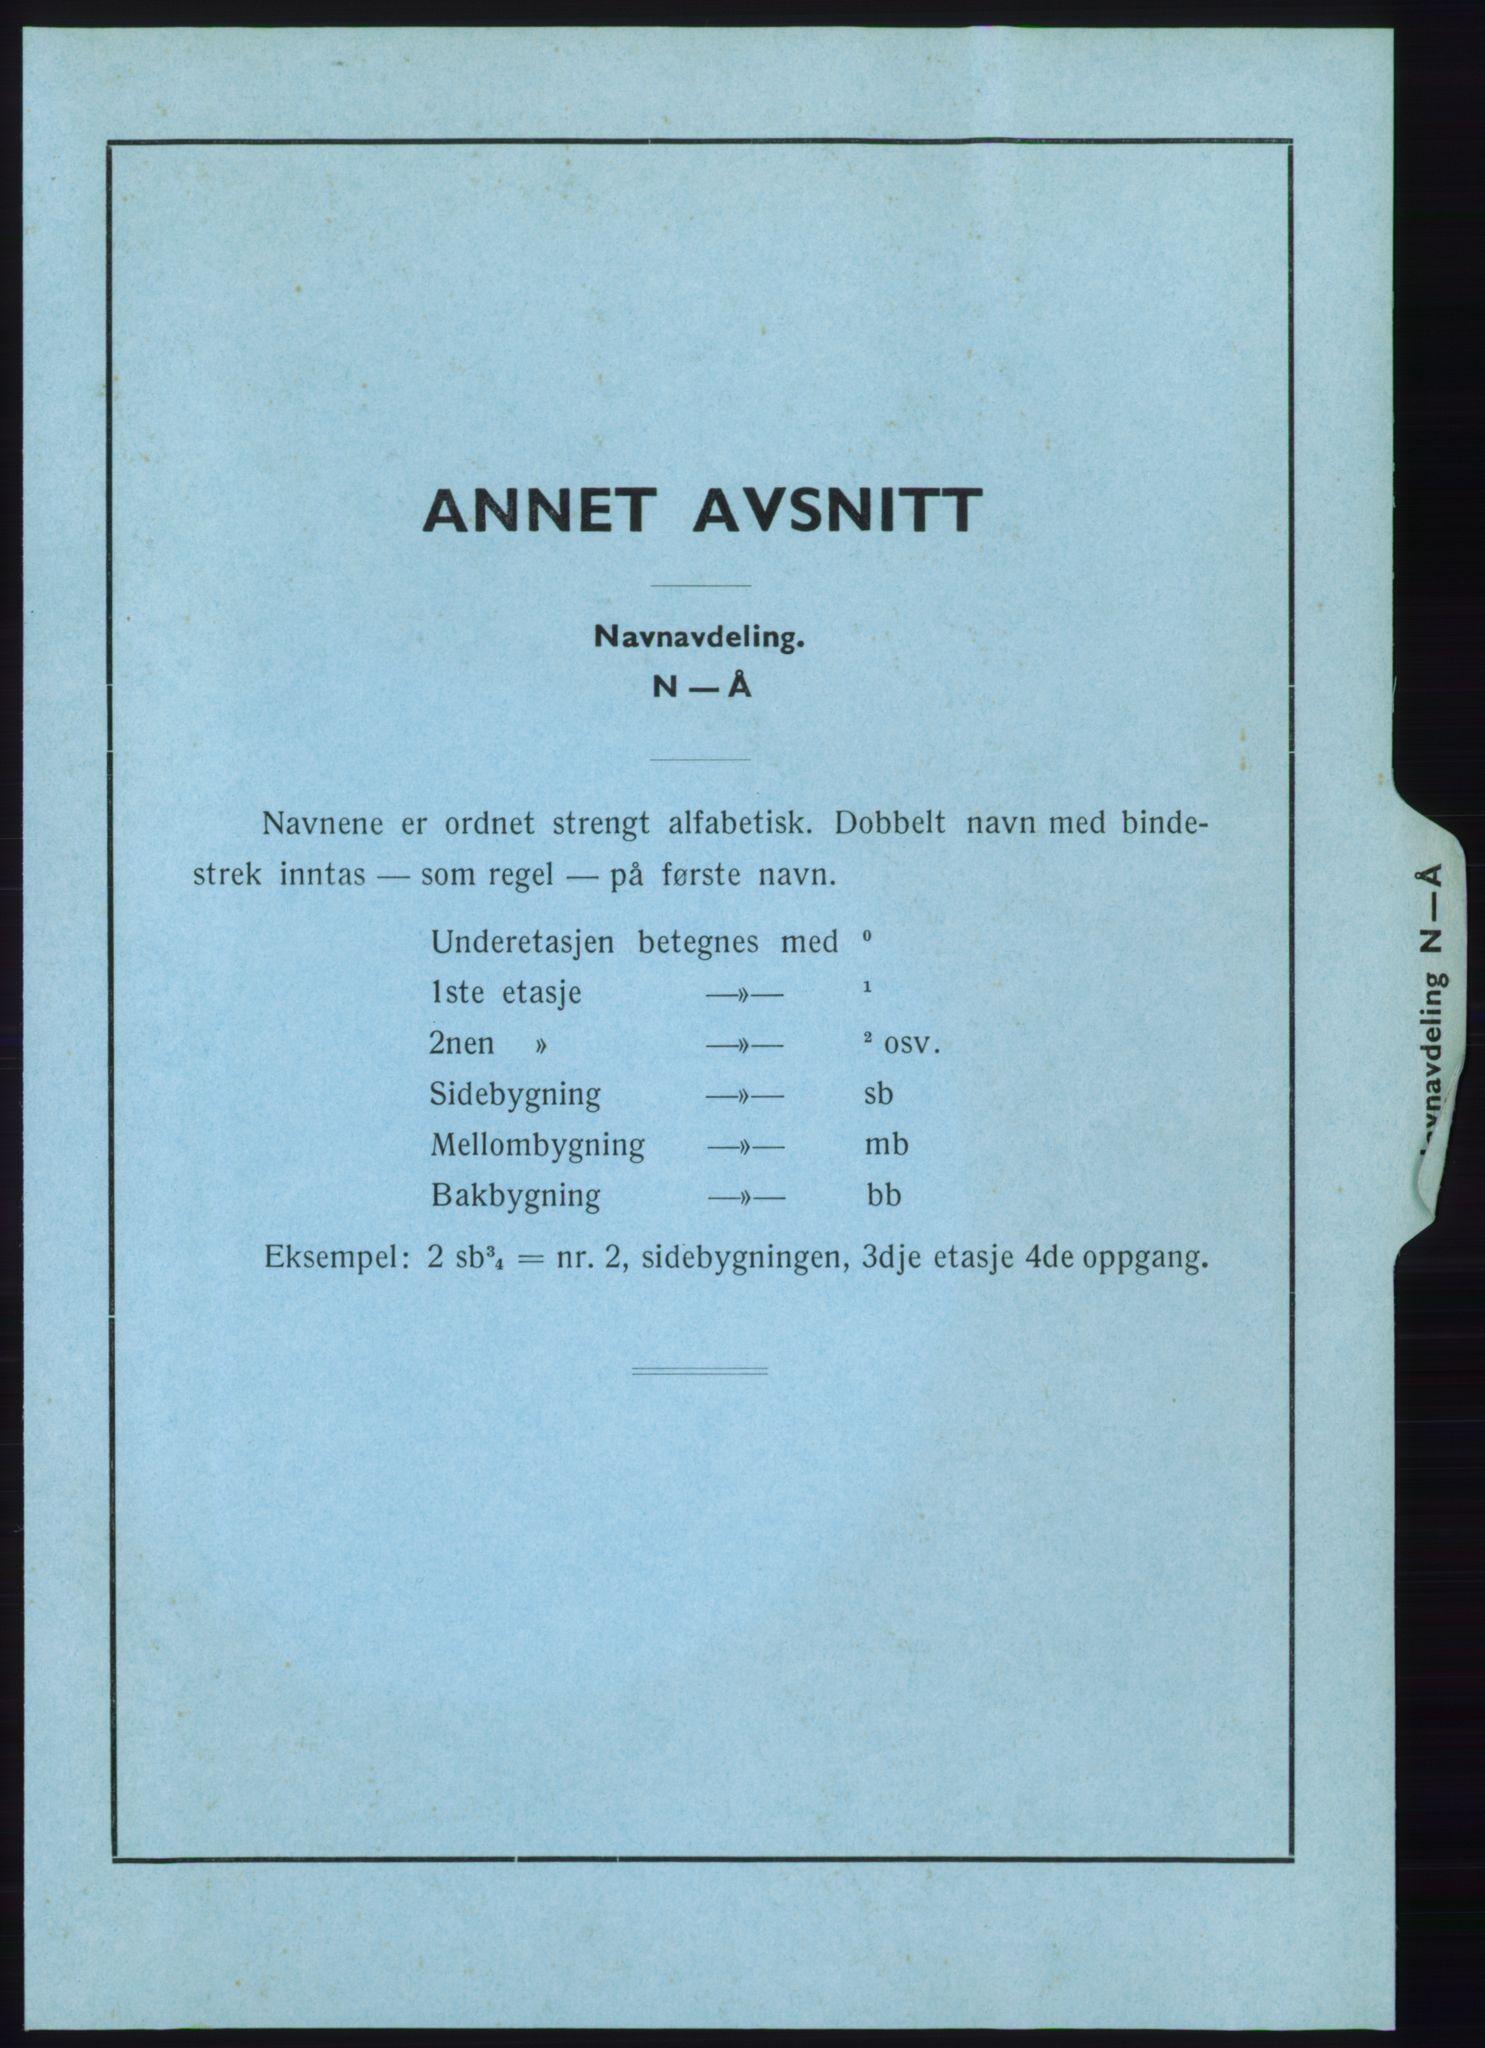 PUBL, Kristiania/Oslo adressebok, 1965-1966